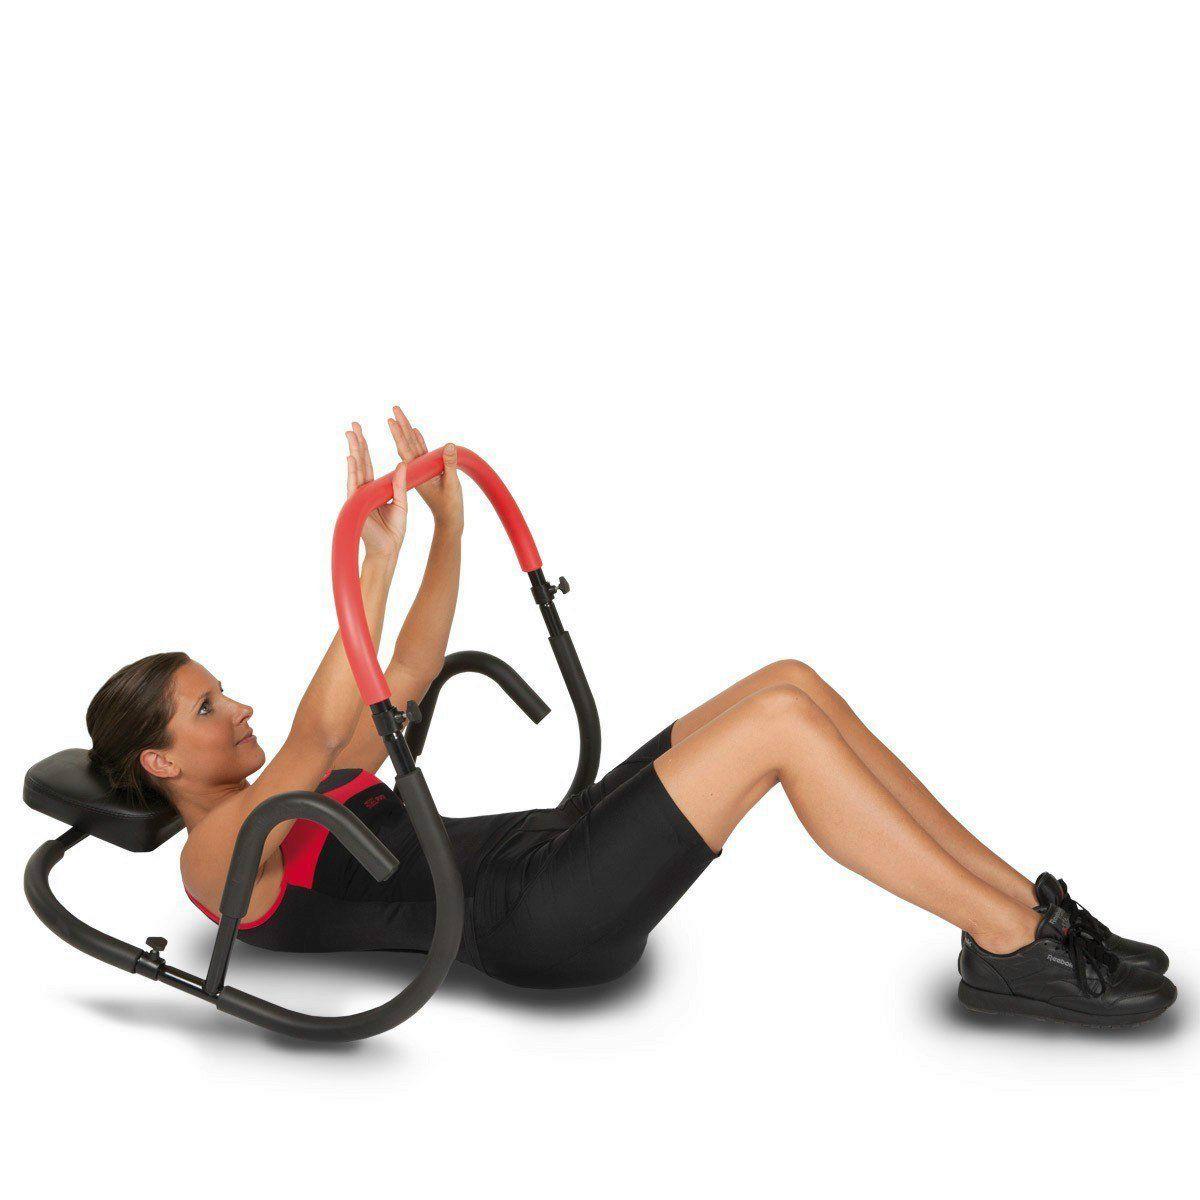 6631-hammer-bauchtrainer-ab-roller-fitness